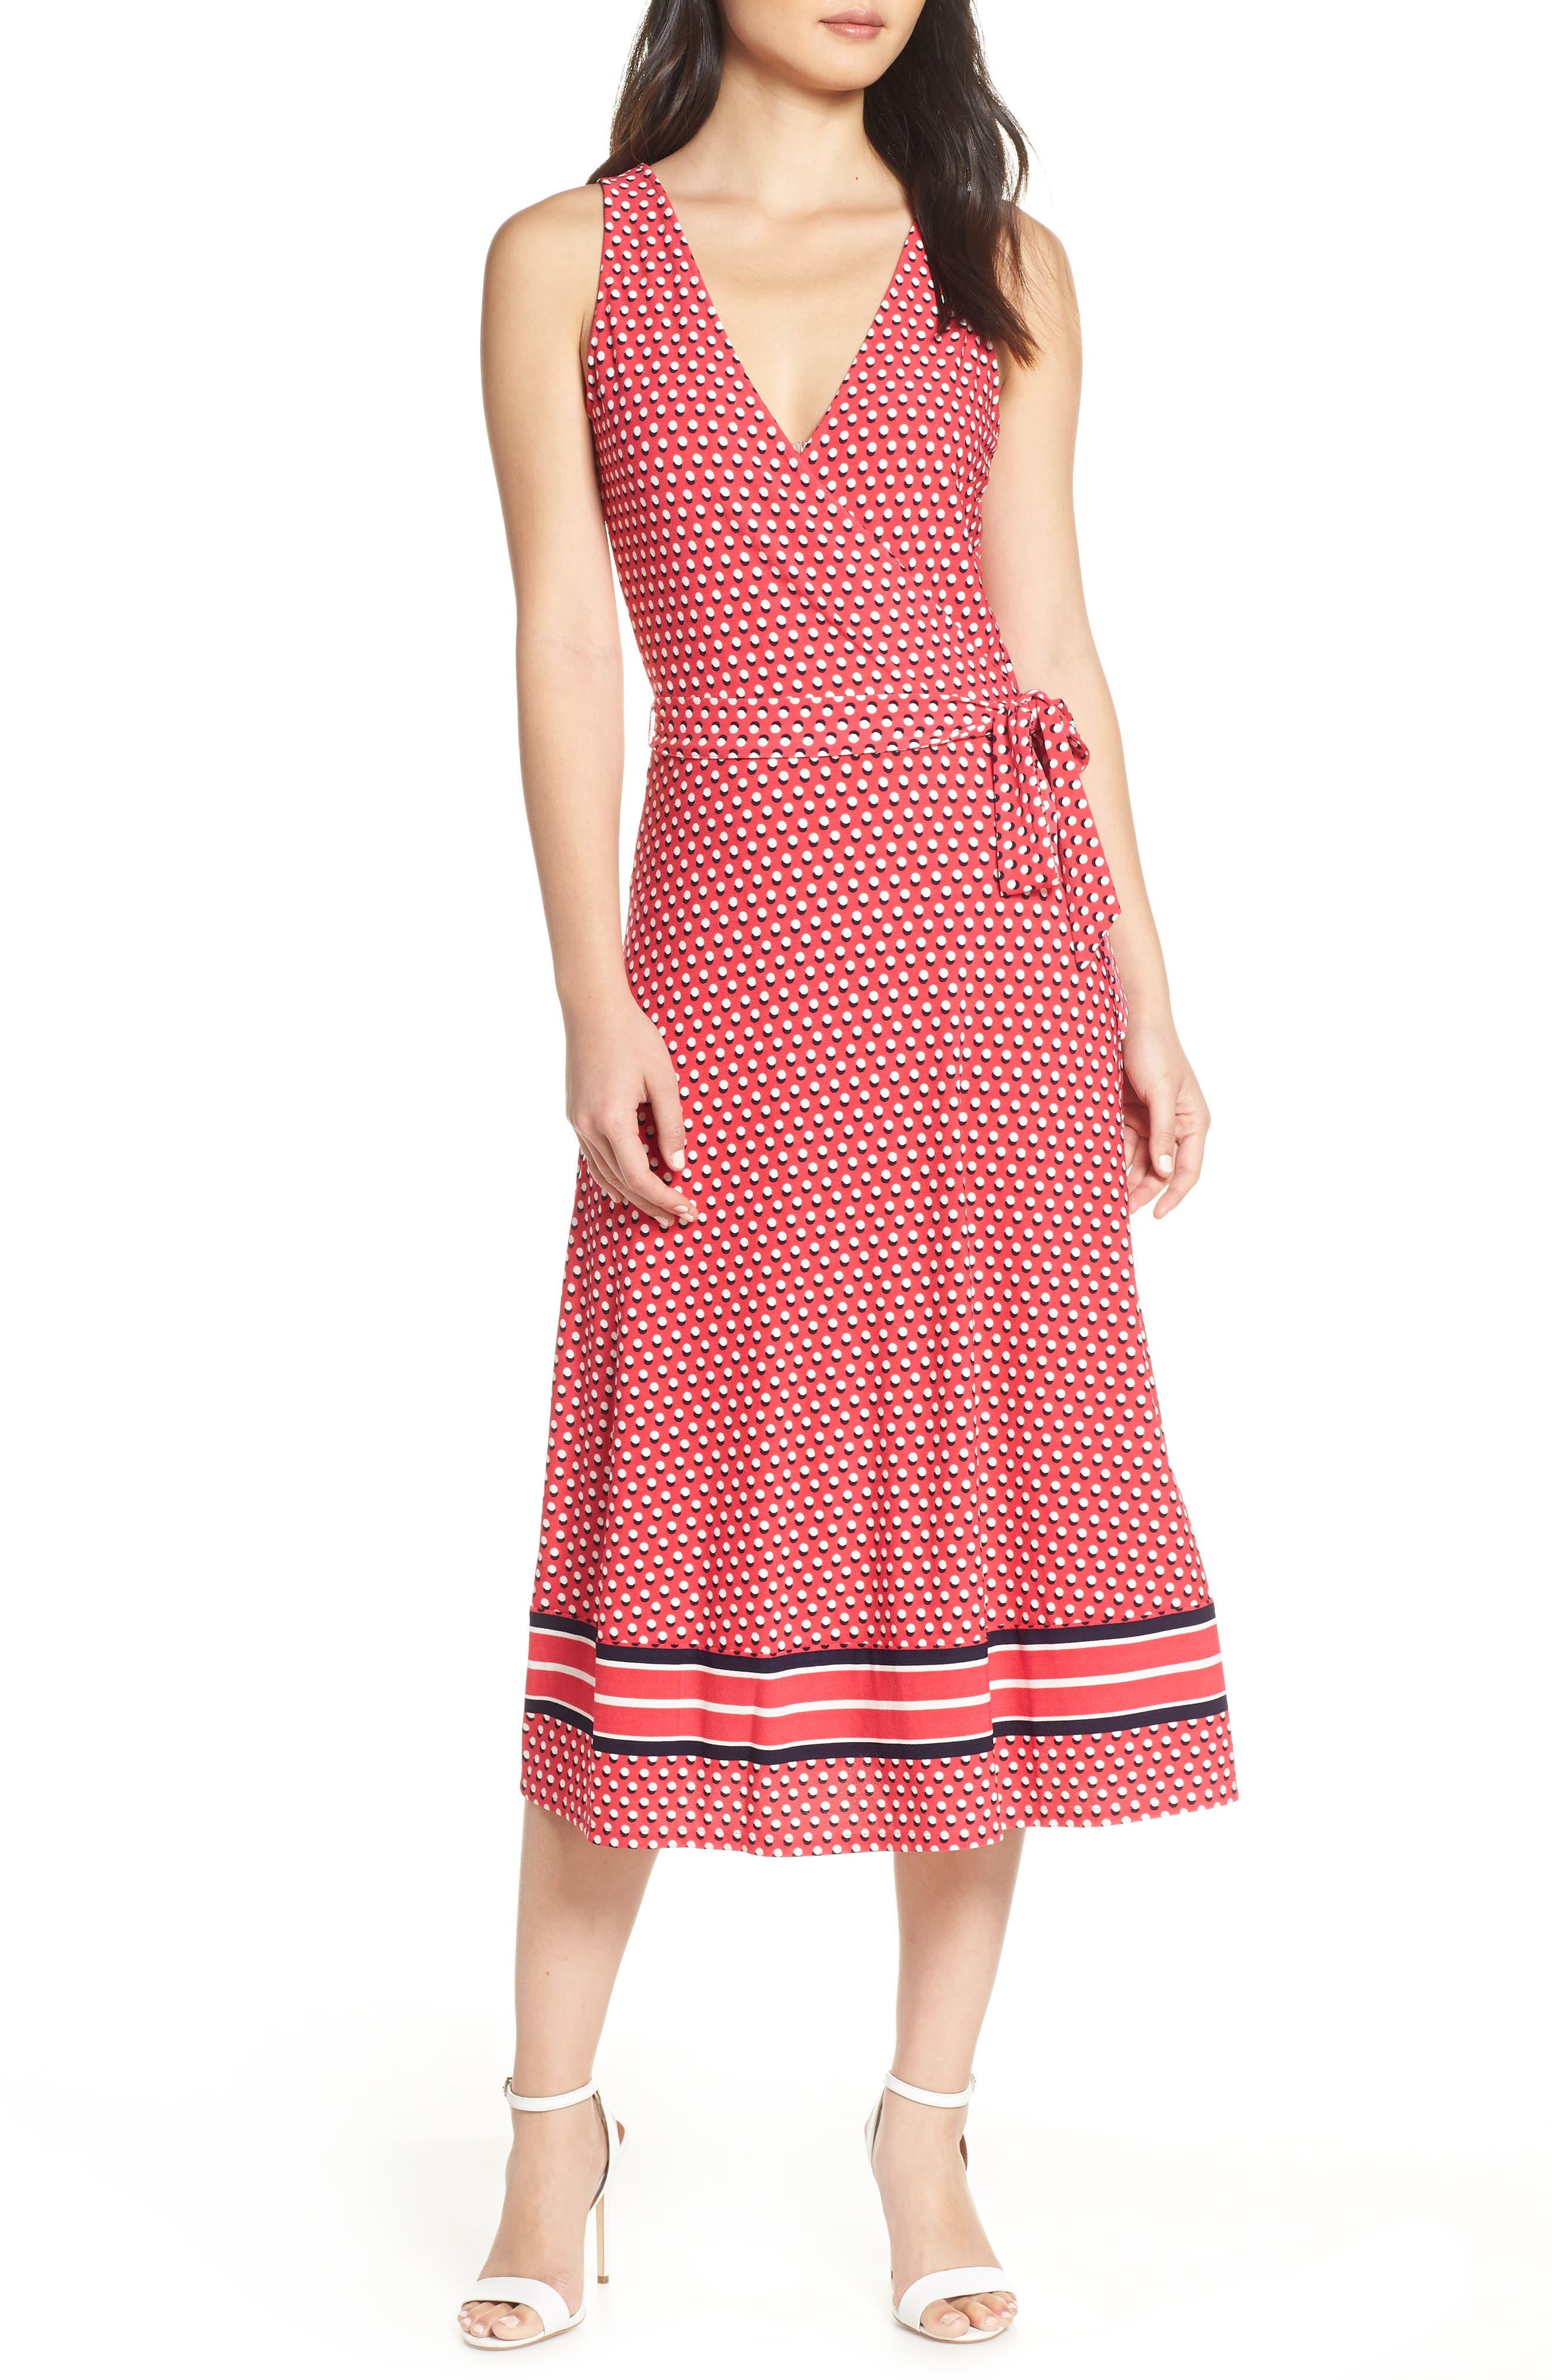 Leota Justine Border Print Wrap Dress, Red